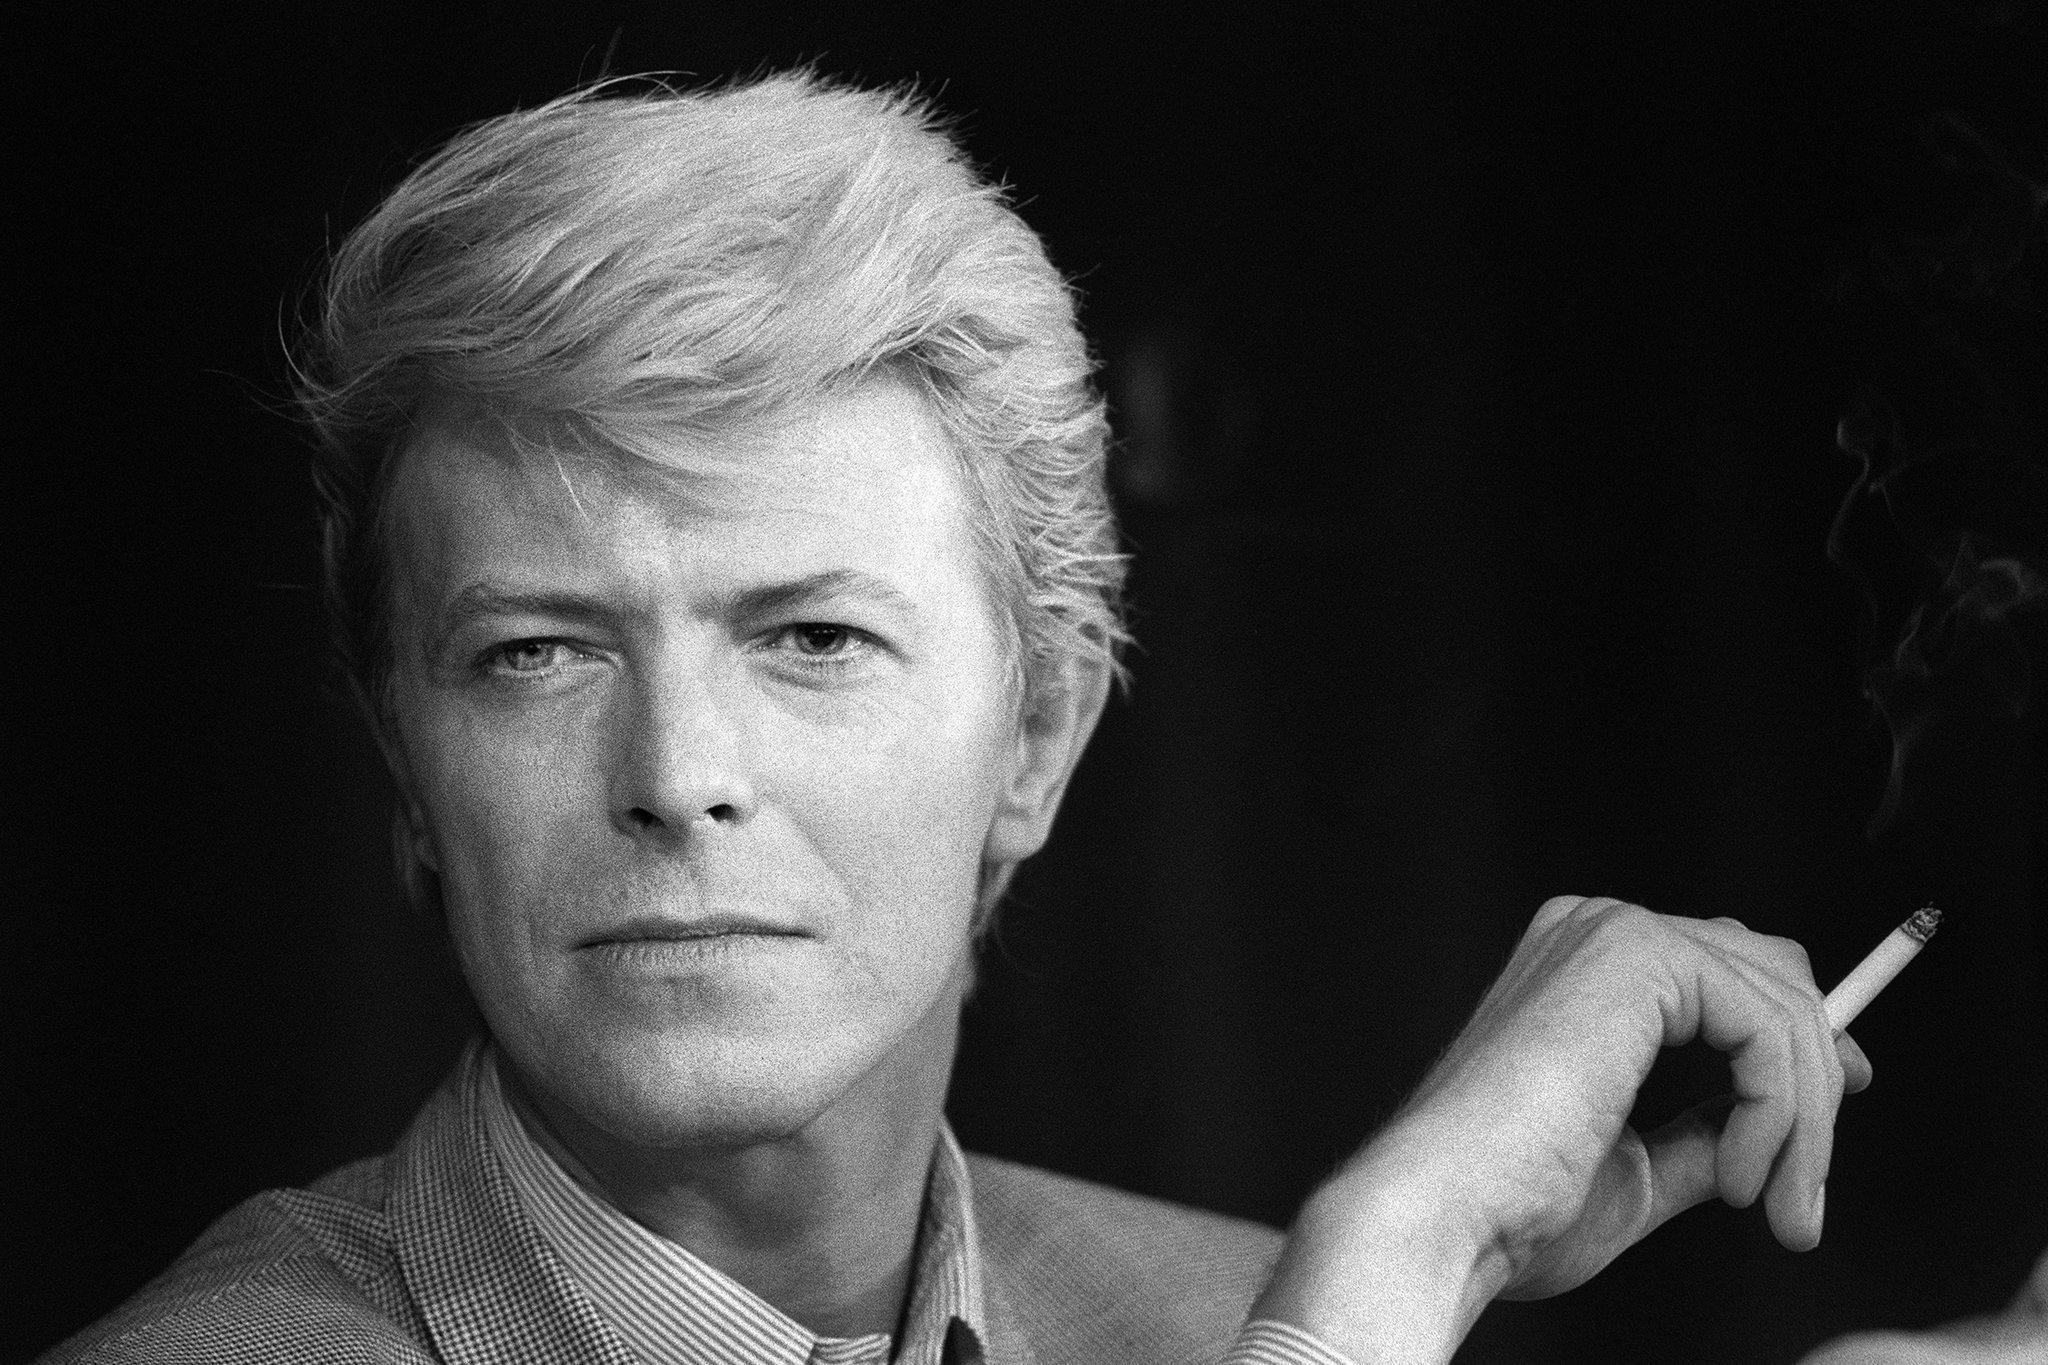 Absolute Bowie: ένα μιούζικαλ αφιερωμένο στον David Bowie στο CT Garden Festival